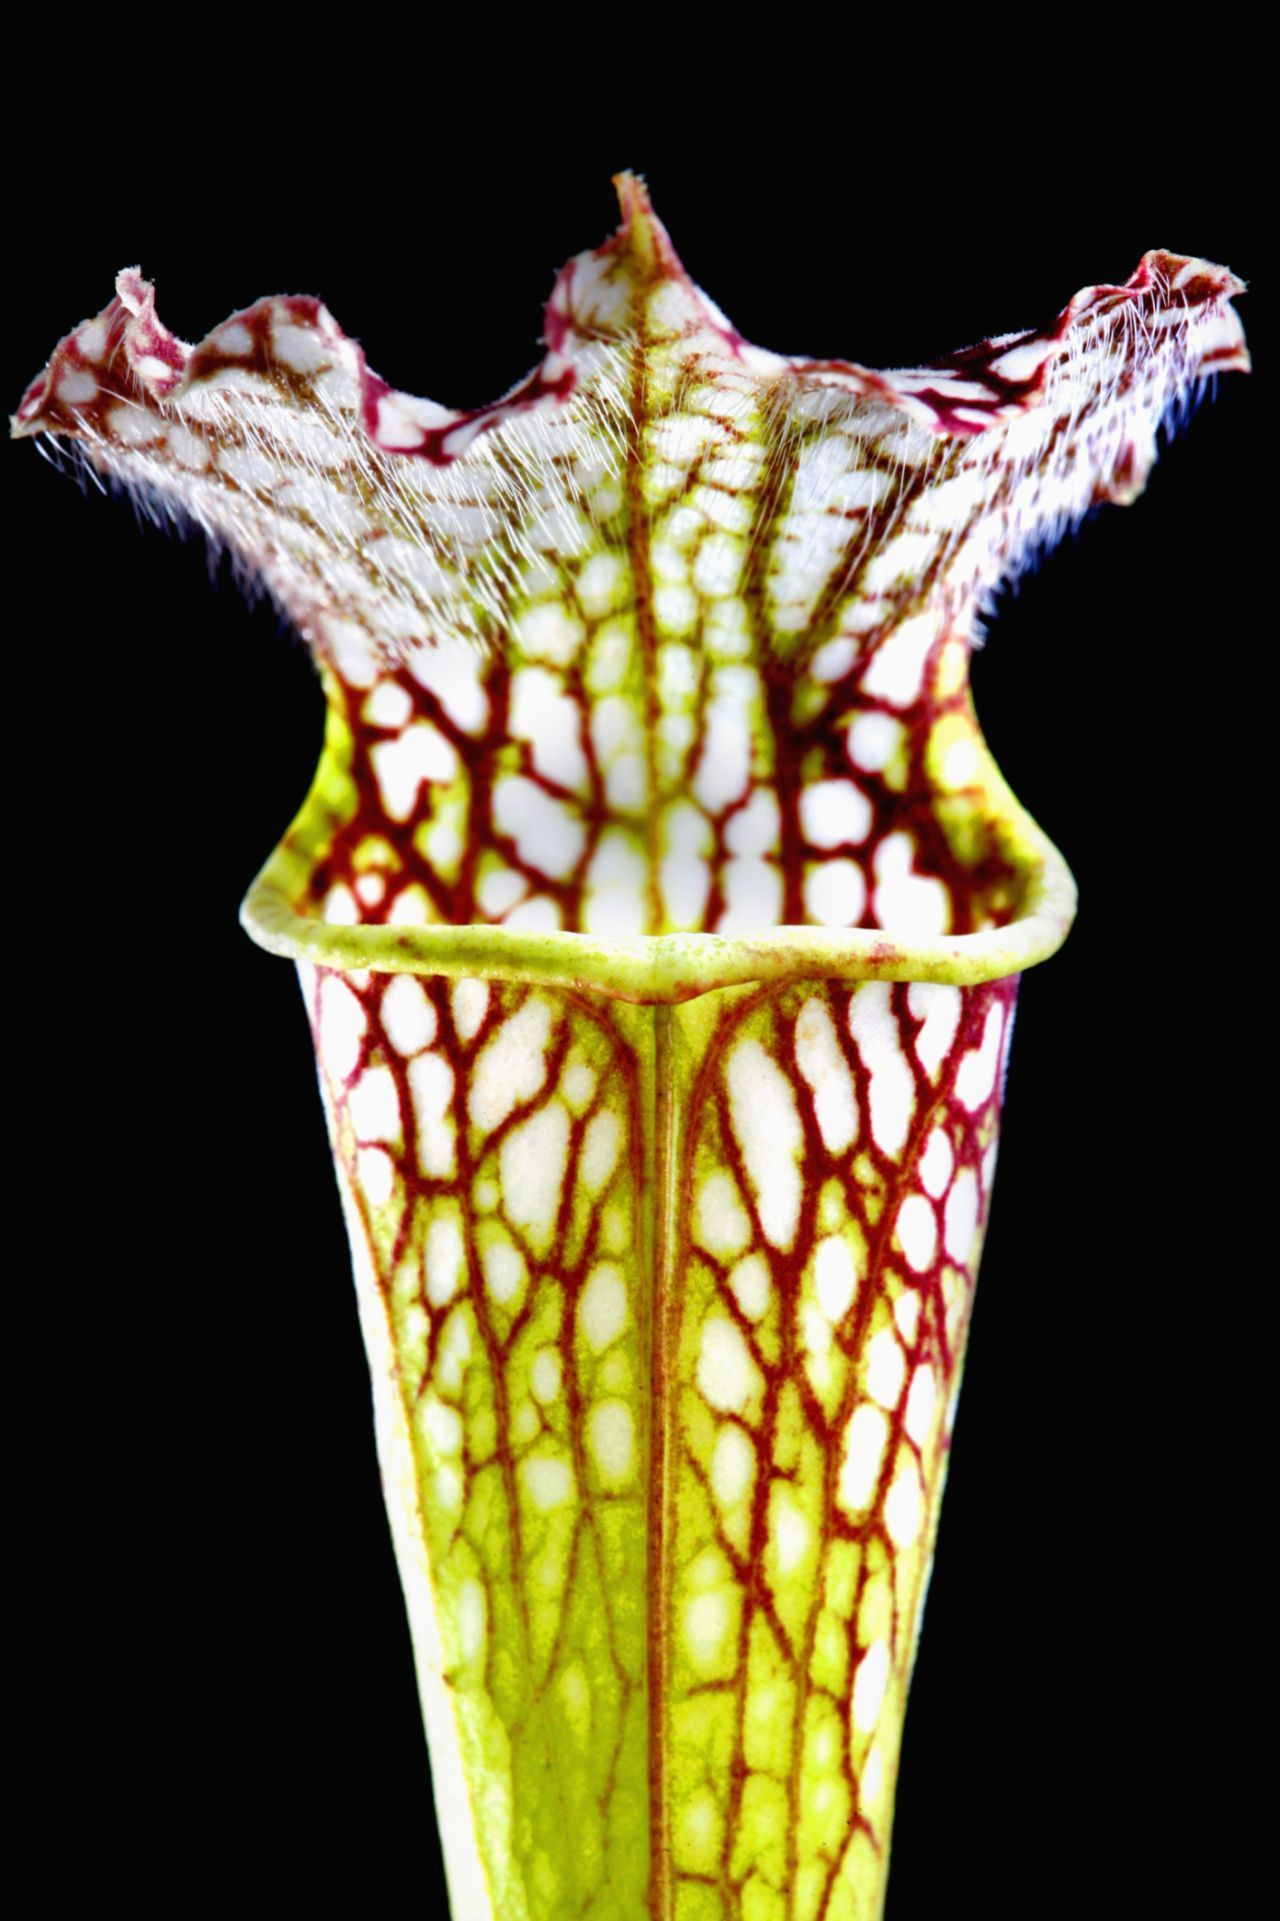 Pin On Top Unusual Plants